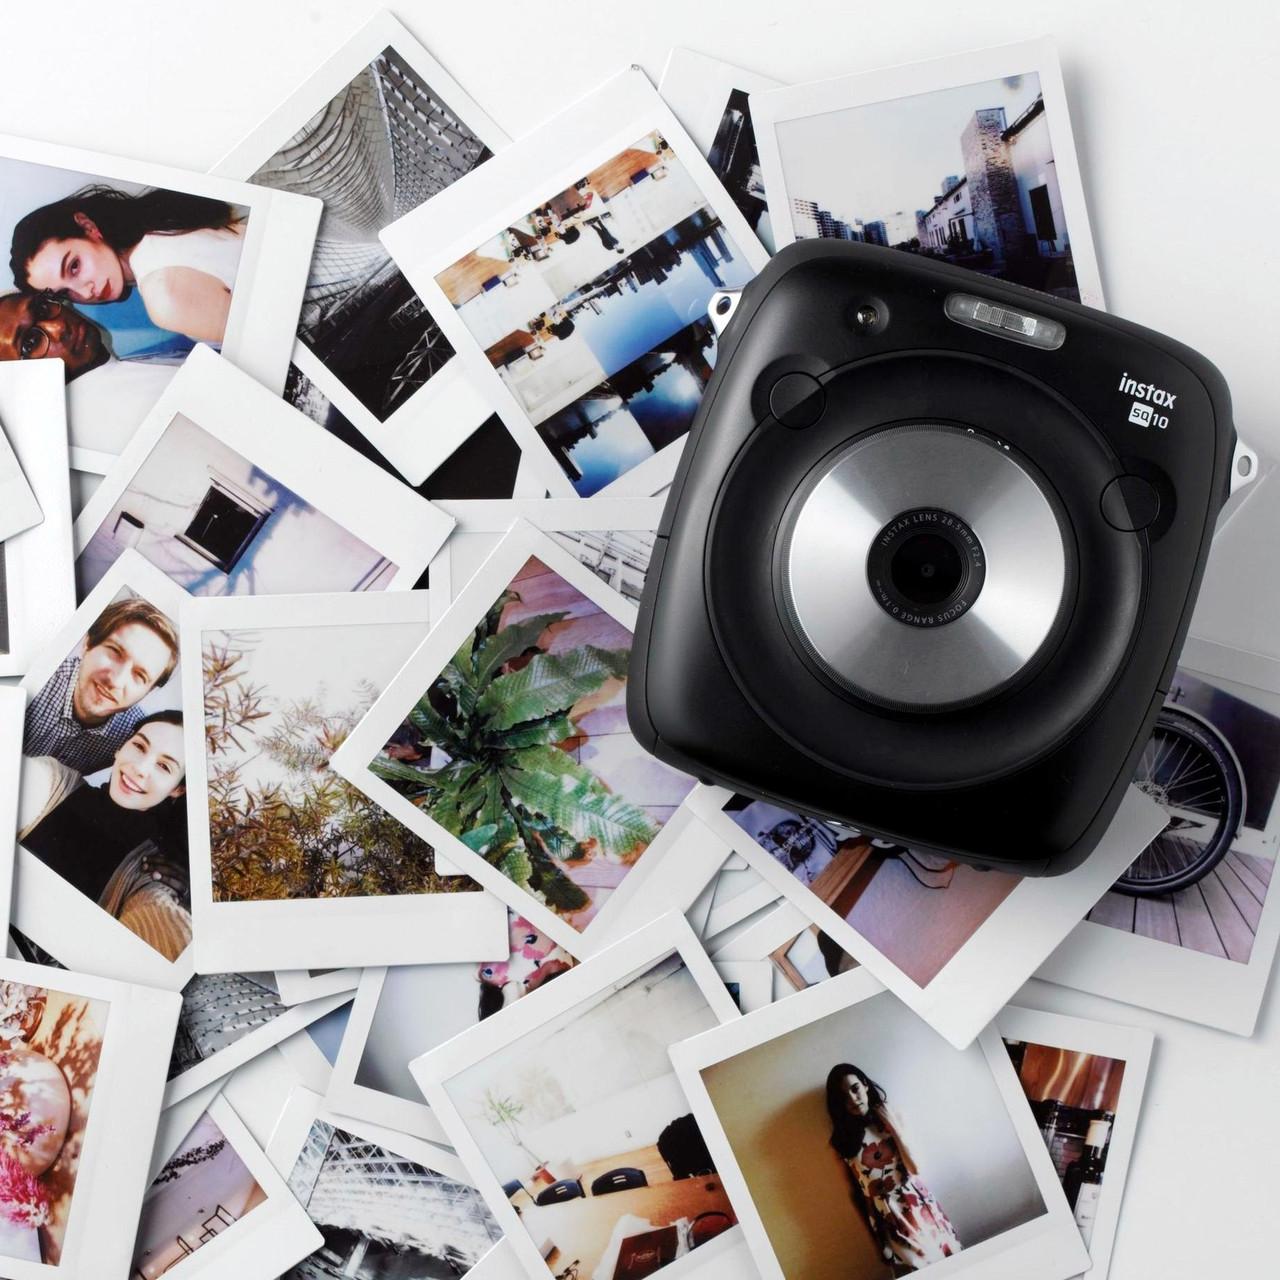 Печать фото в стиле Полароид, Polaroid 90 шт., фото 1